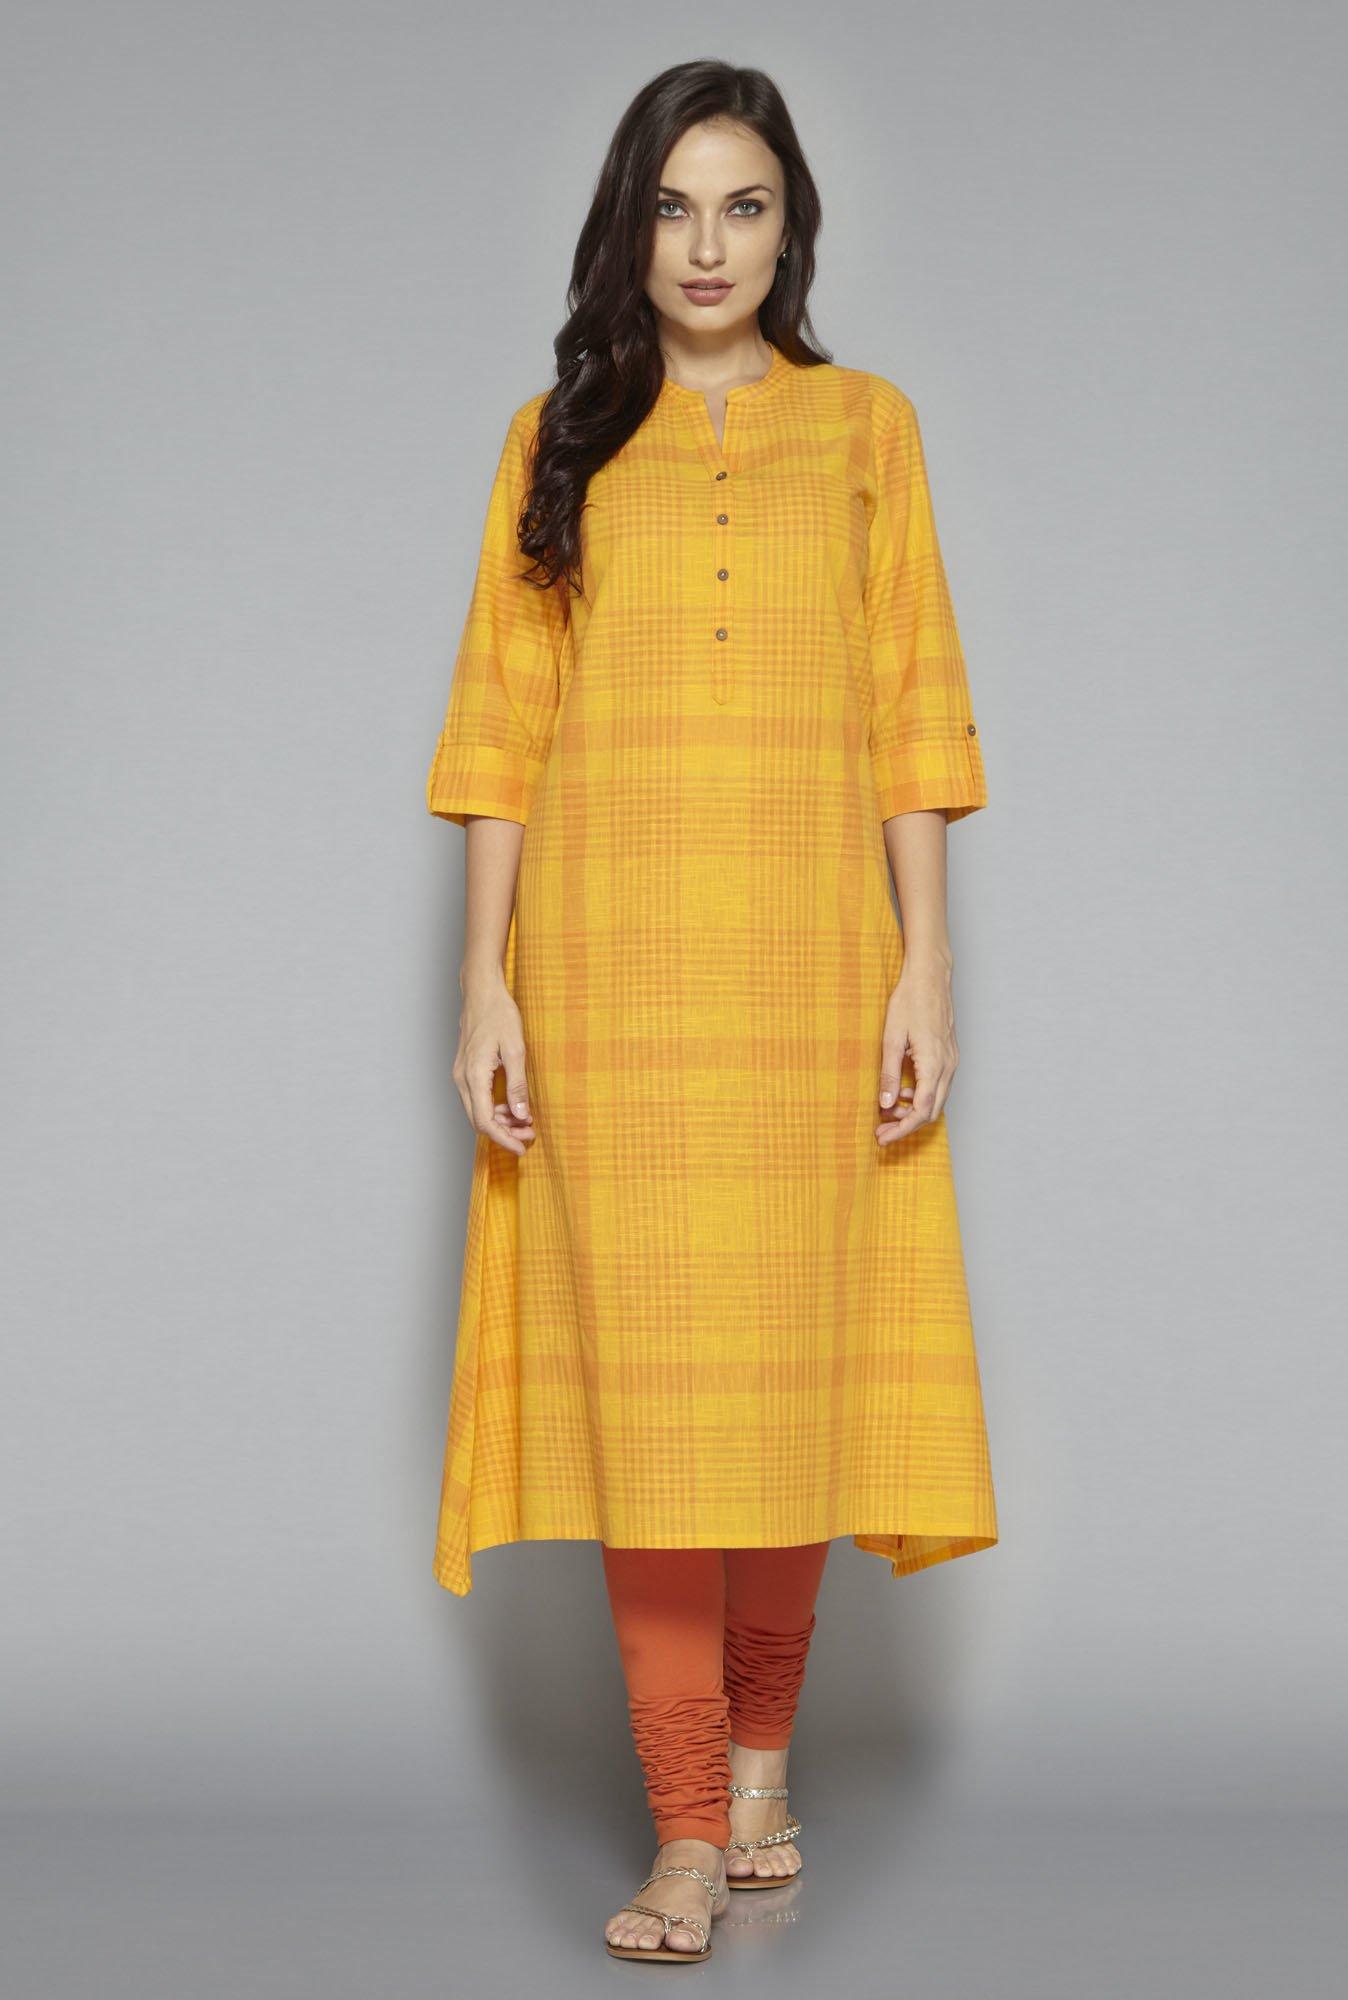 8ee325236 Buy Utsa by Westside Yellow Checks Kurta for Women Online   Tata CLiQ